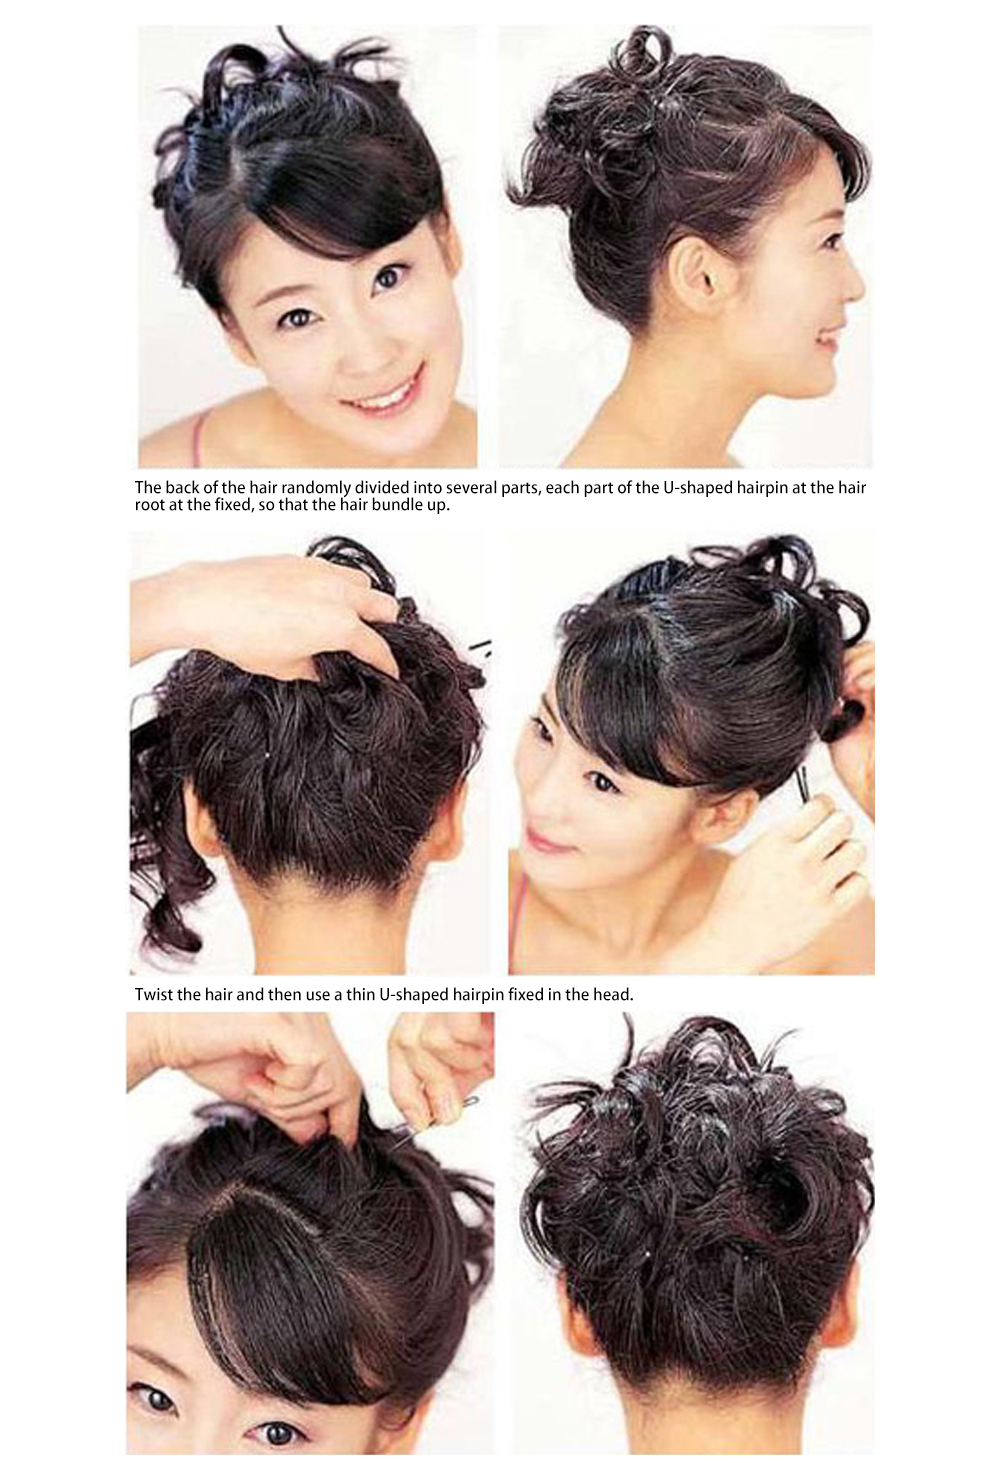 cabelo para hairstyle feminino up-fazer pinos de